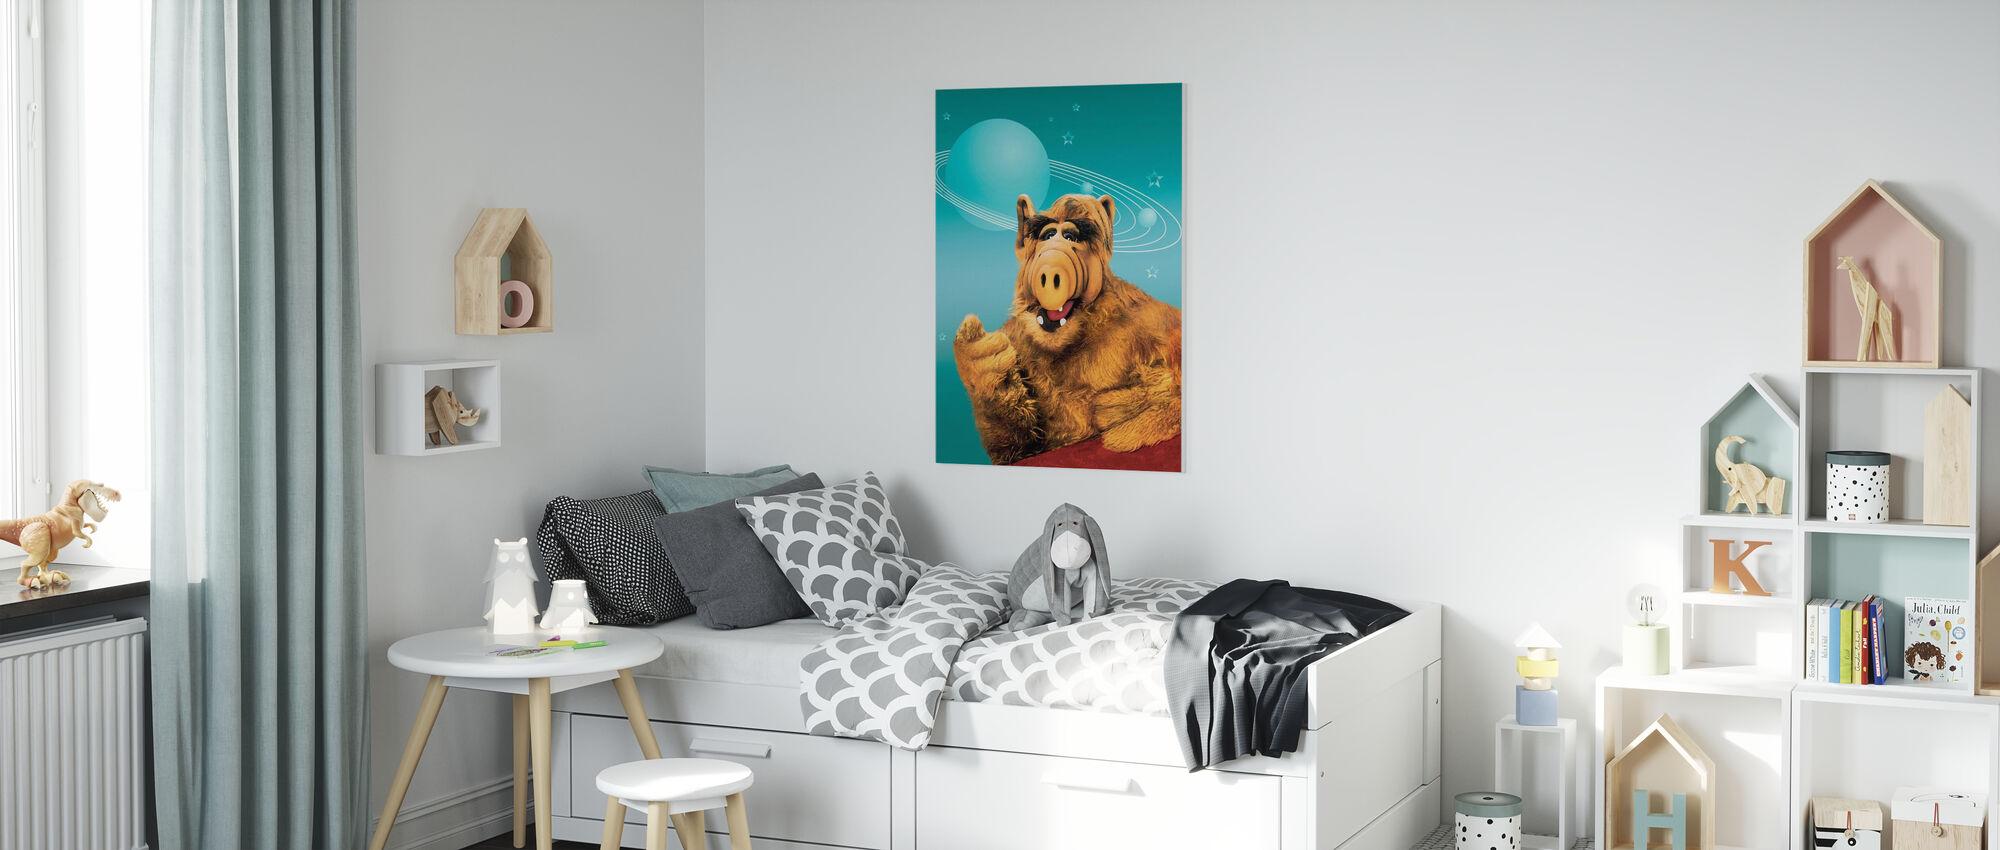 Alf - Paul Fusco en Tom Patchett - Canvas print - Kinderkamer